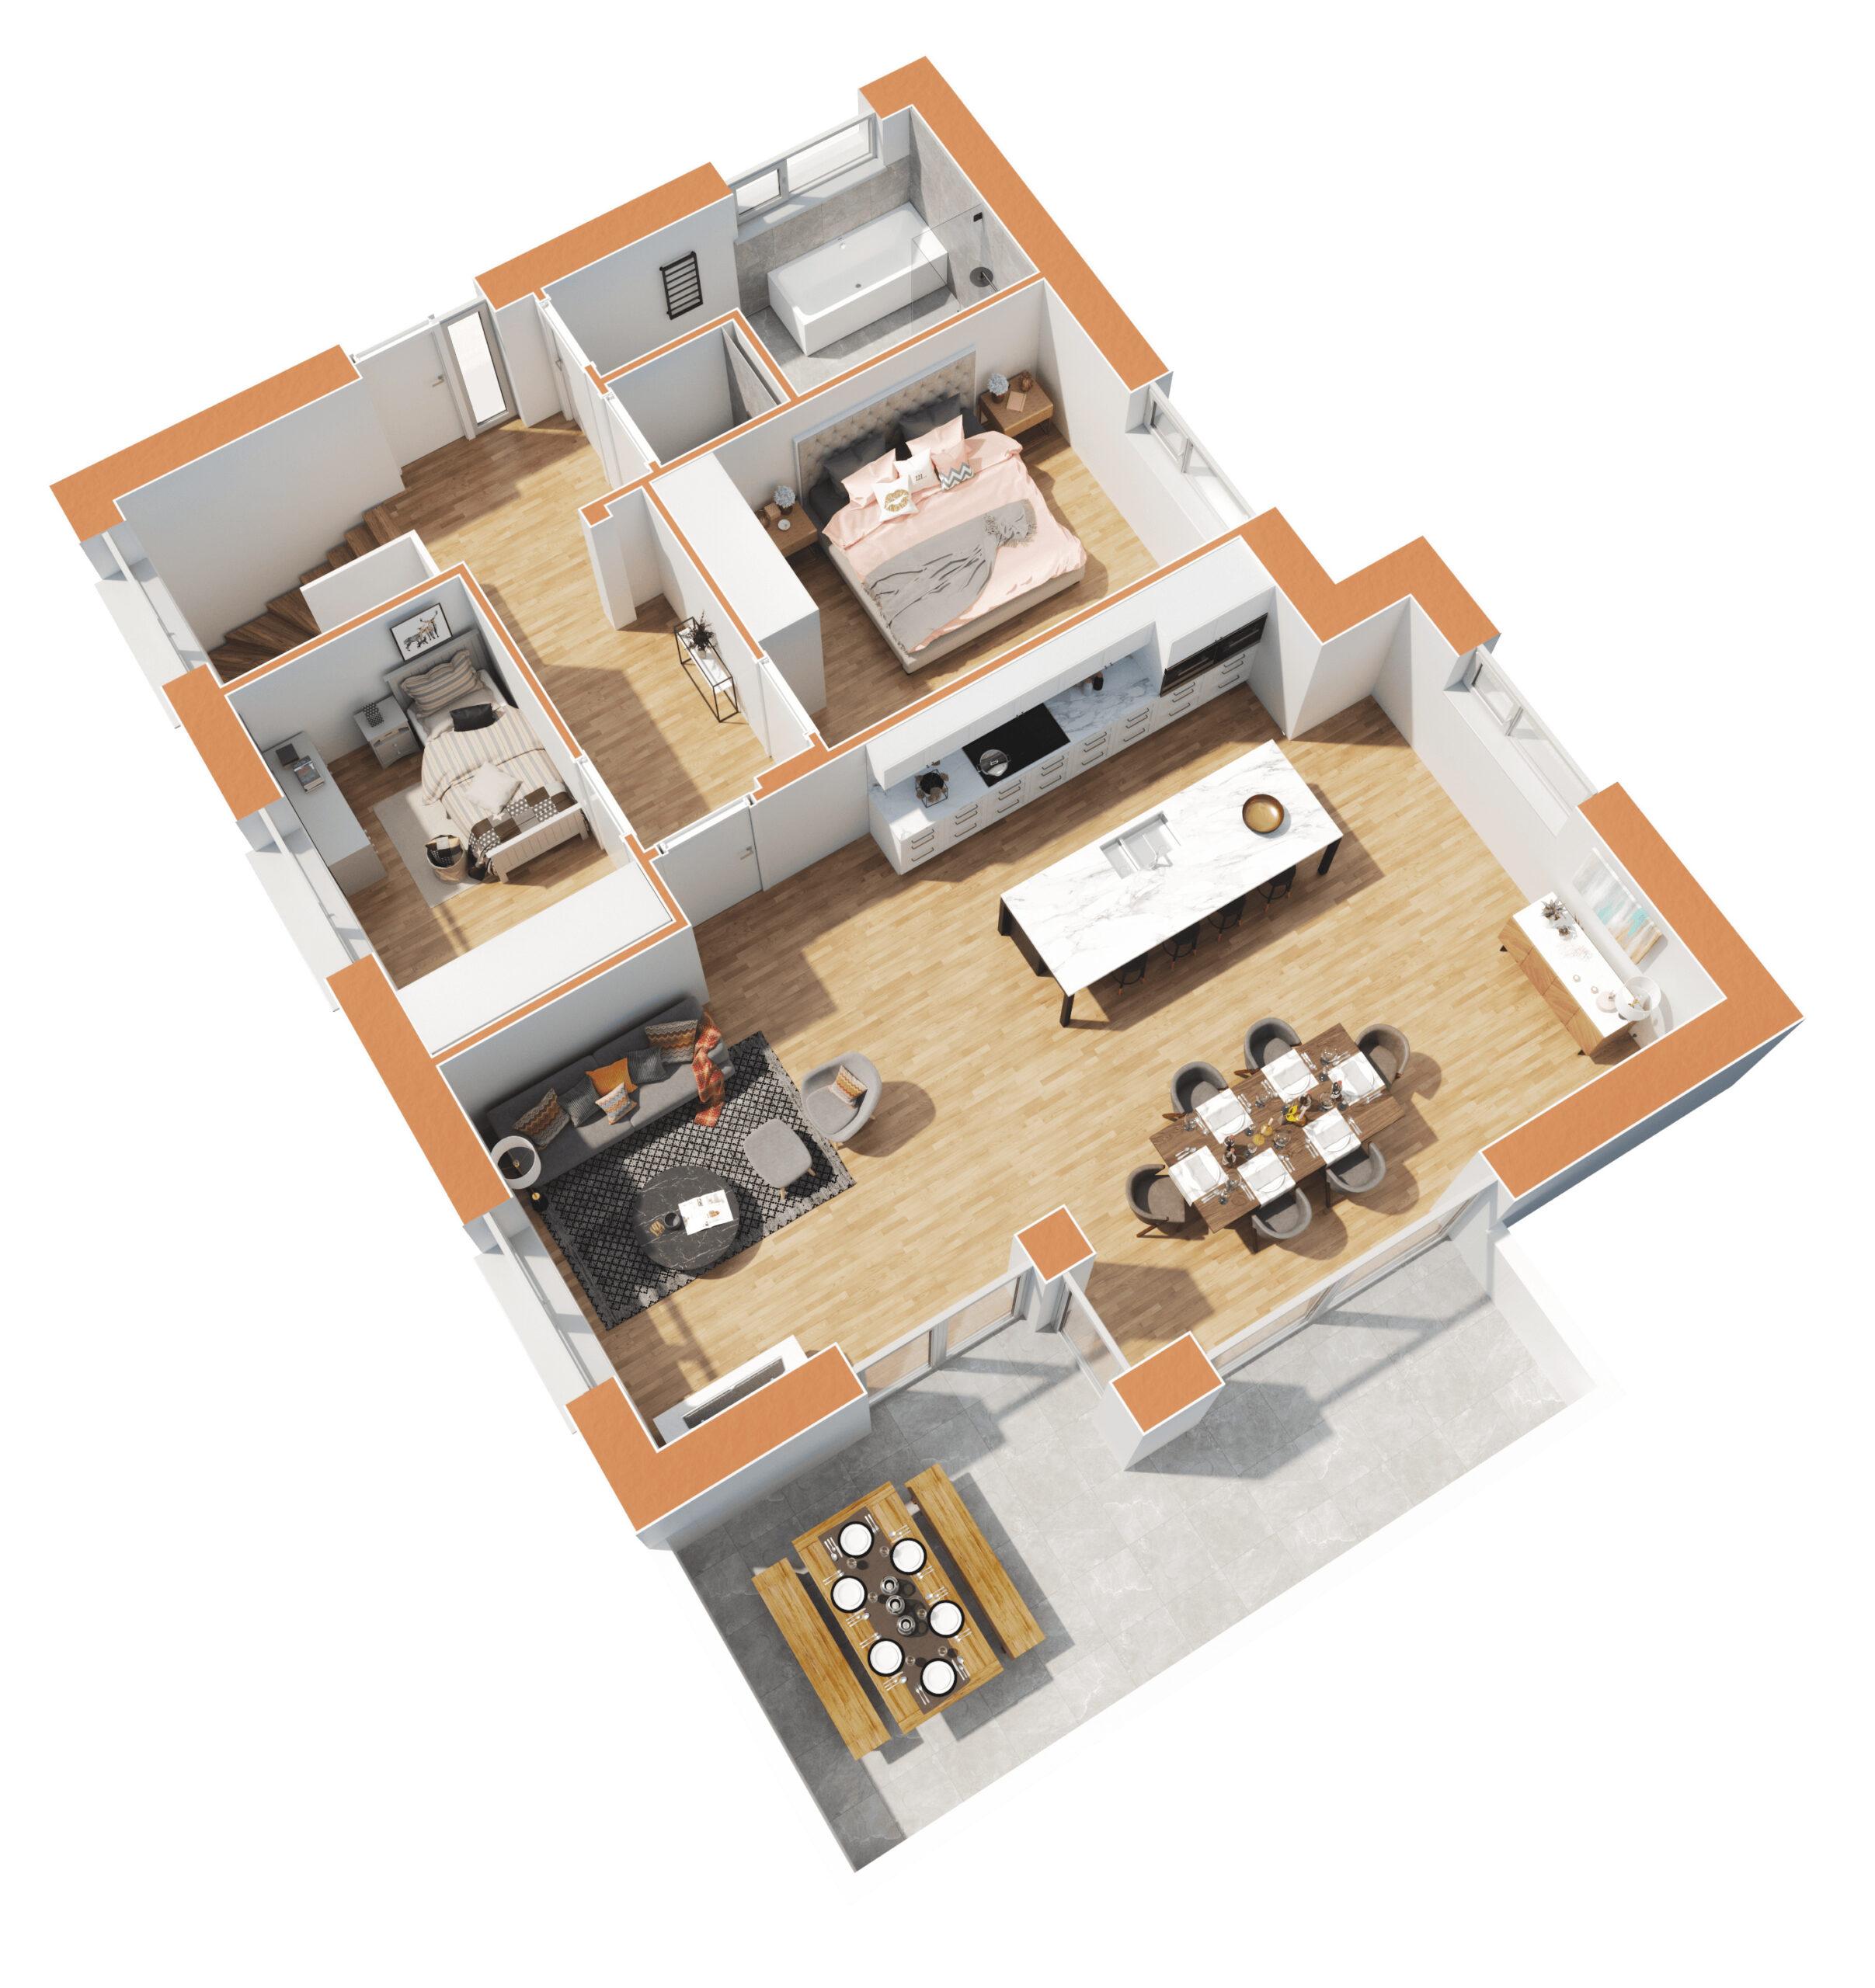 Haus 2 - Top3 - Wohnebene